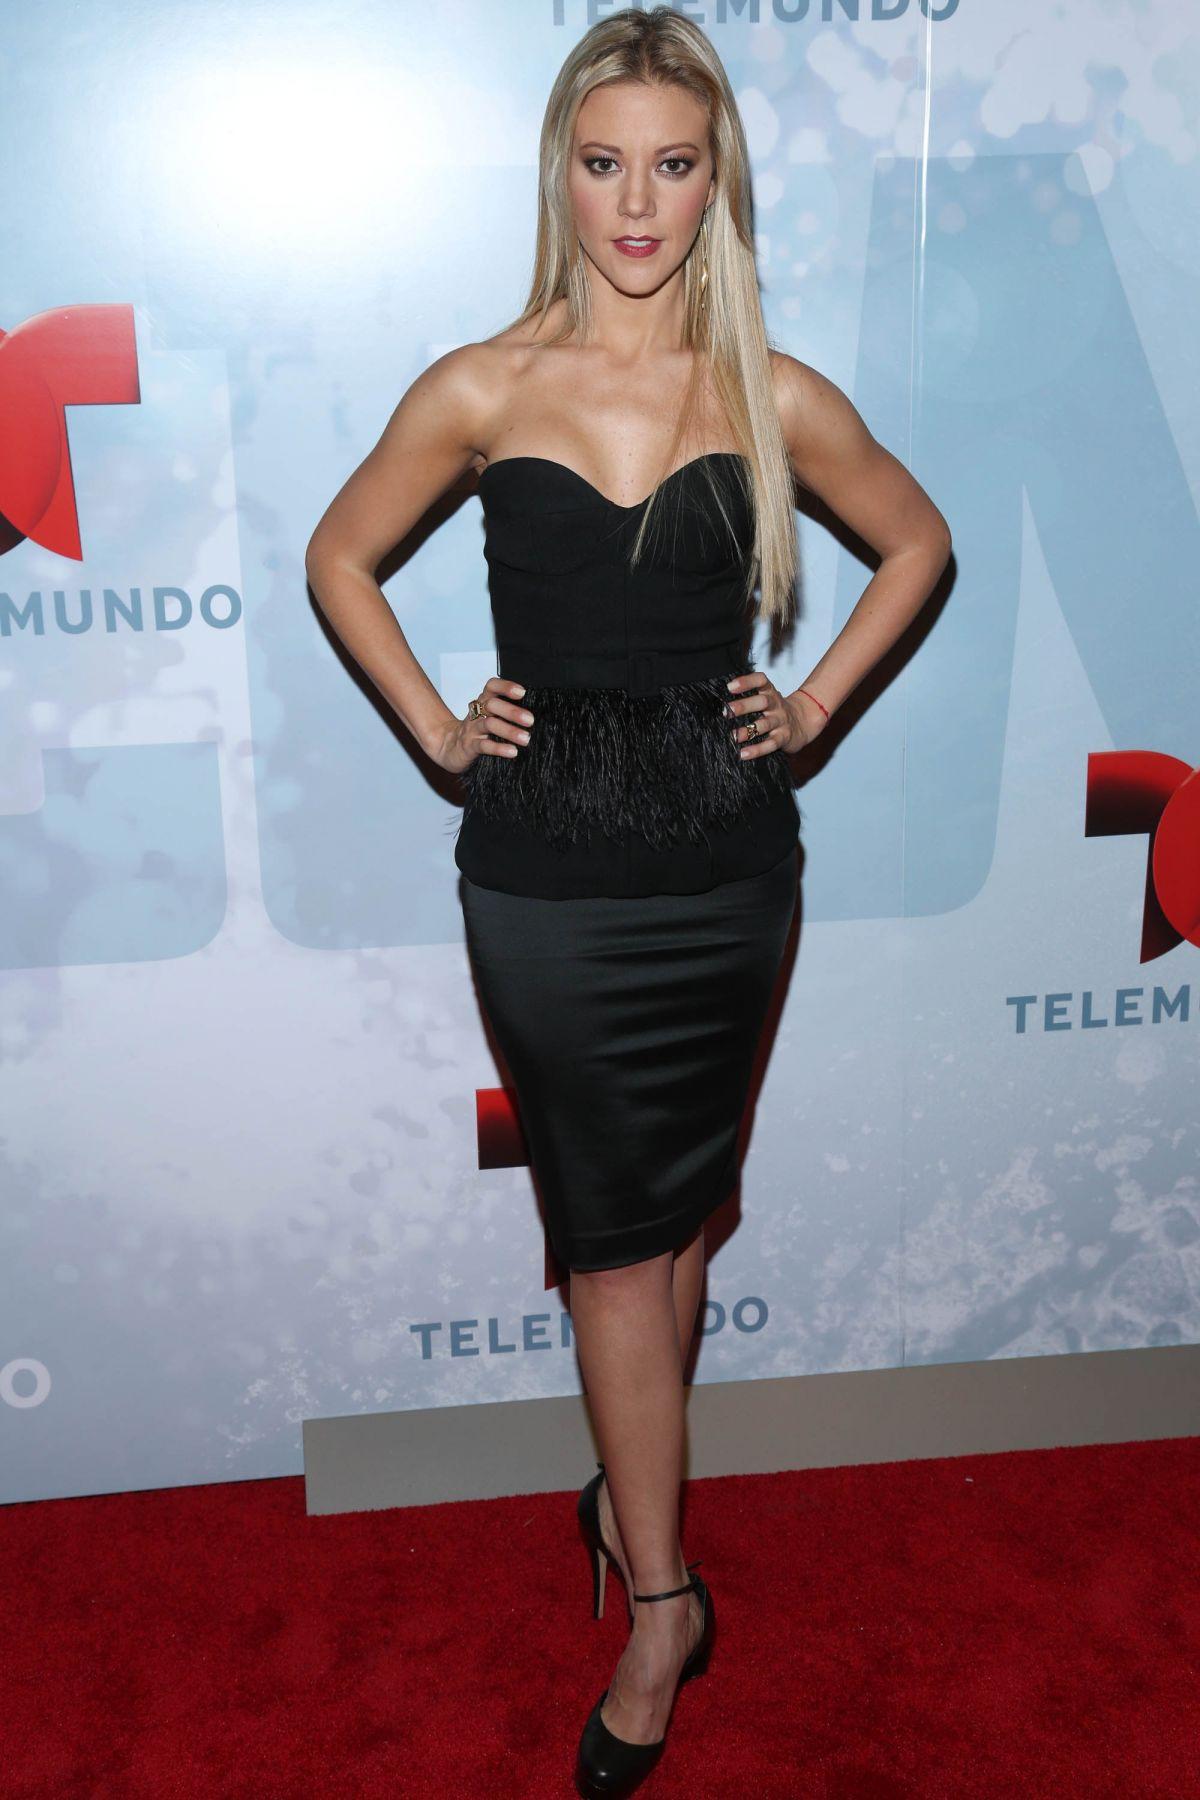 FERNANDA CASTILLO at Telemundo Upfront 2014 in New York